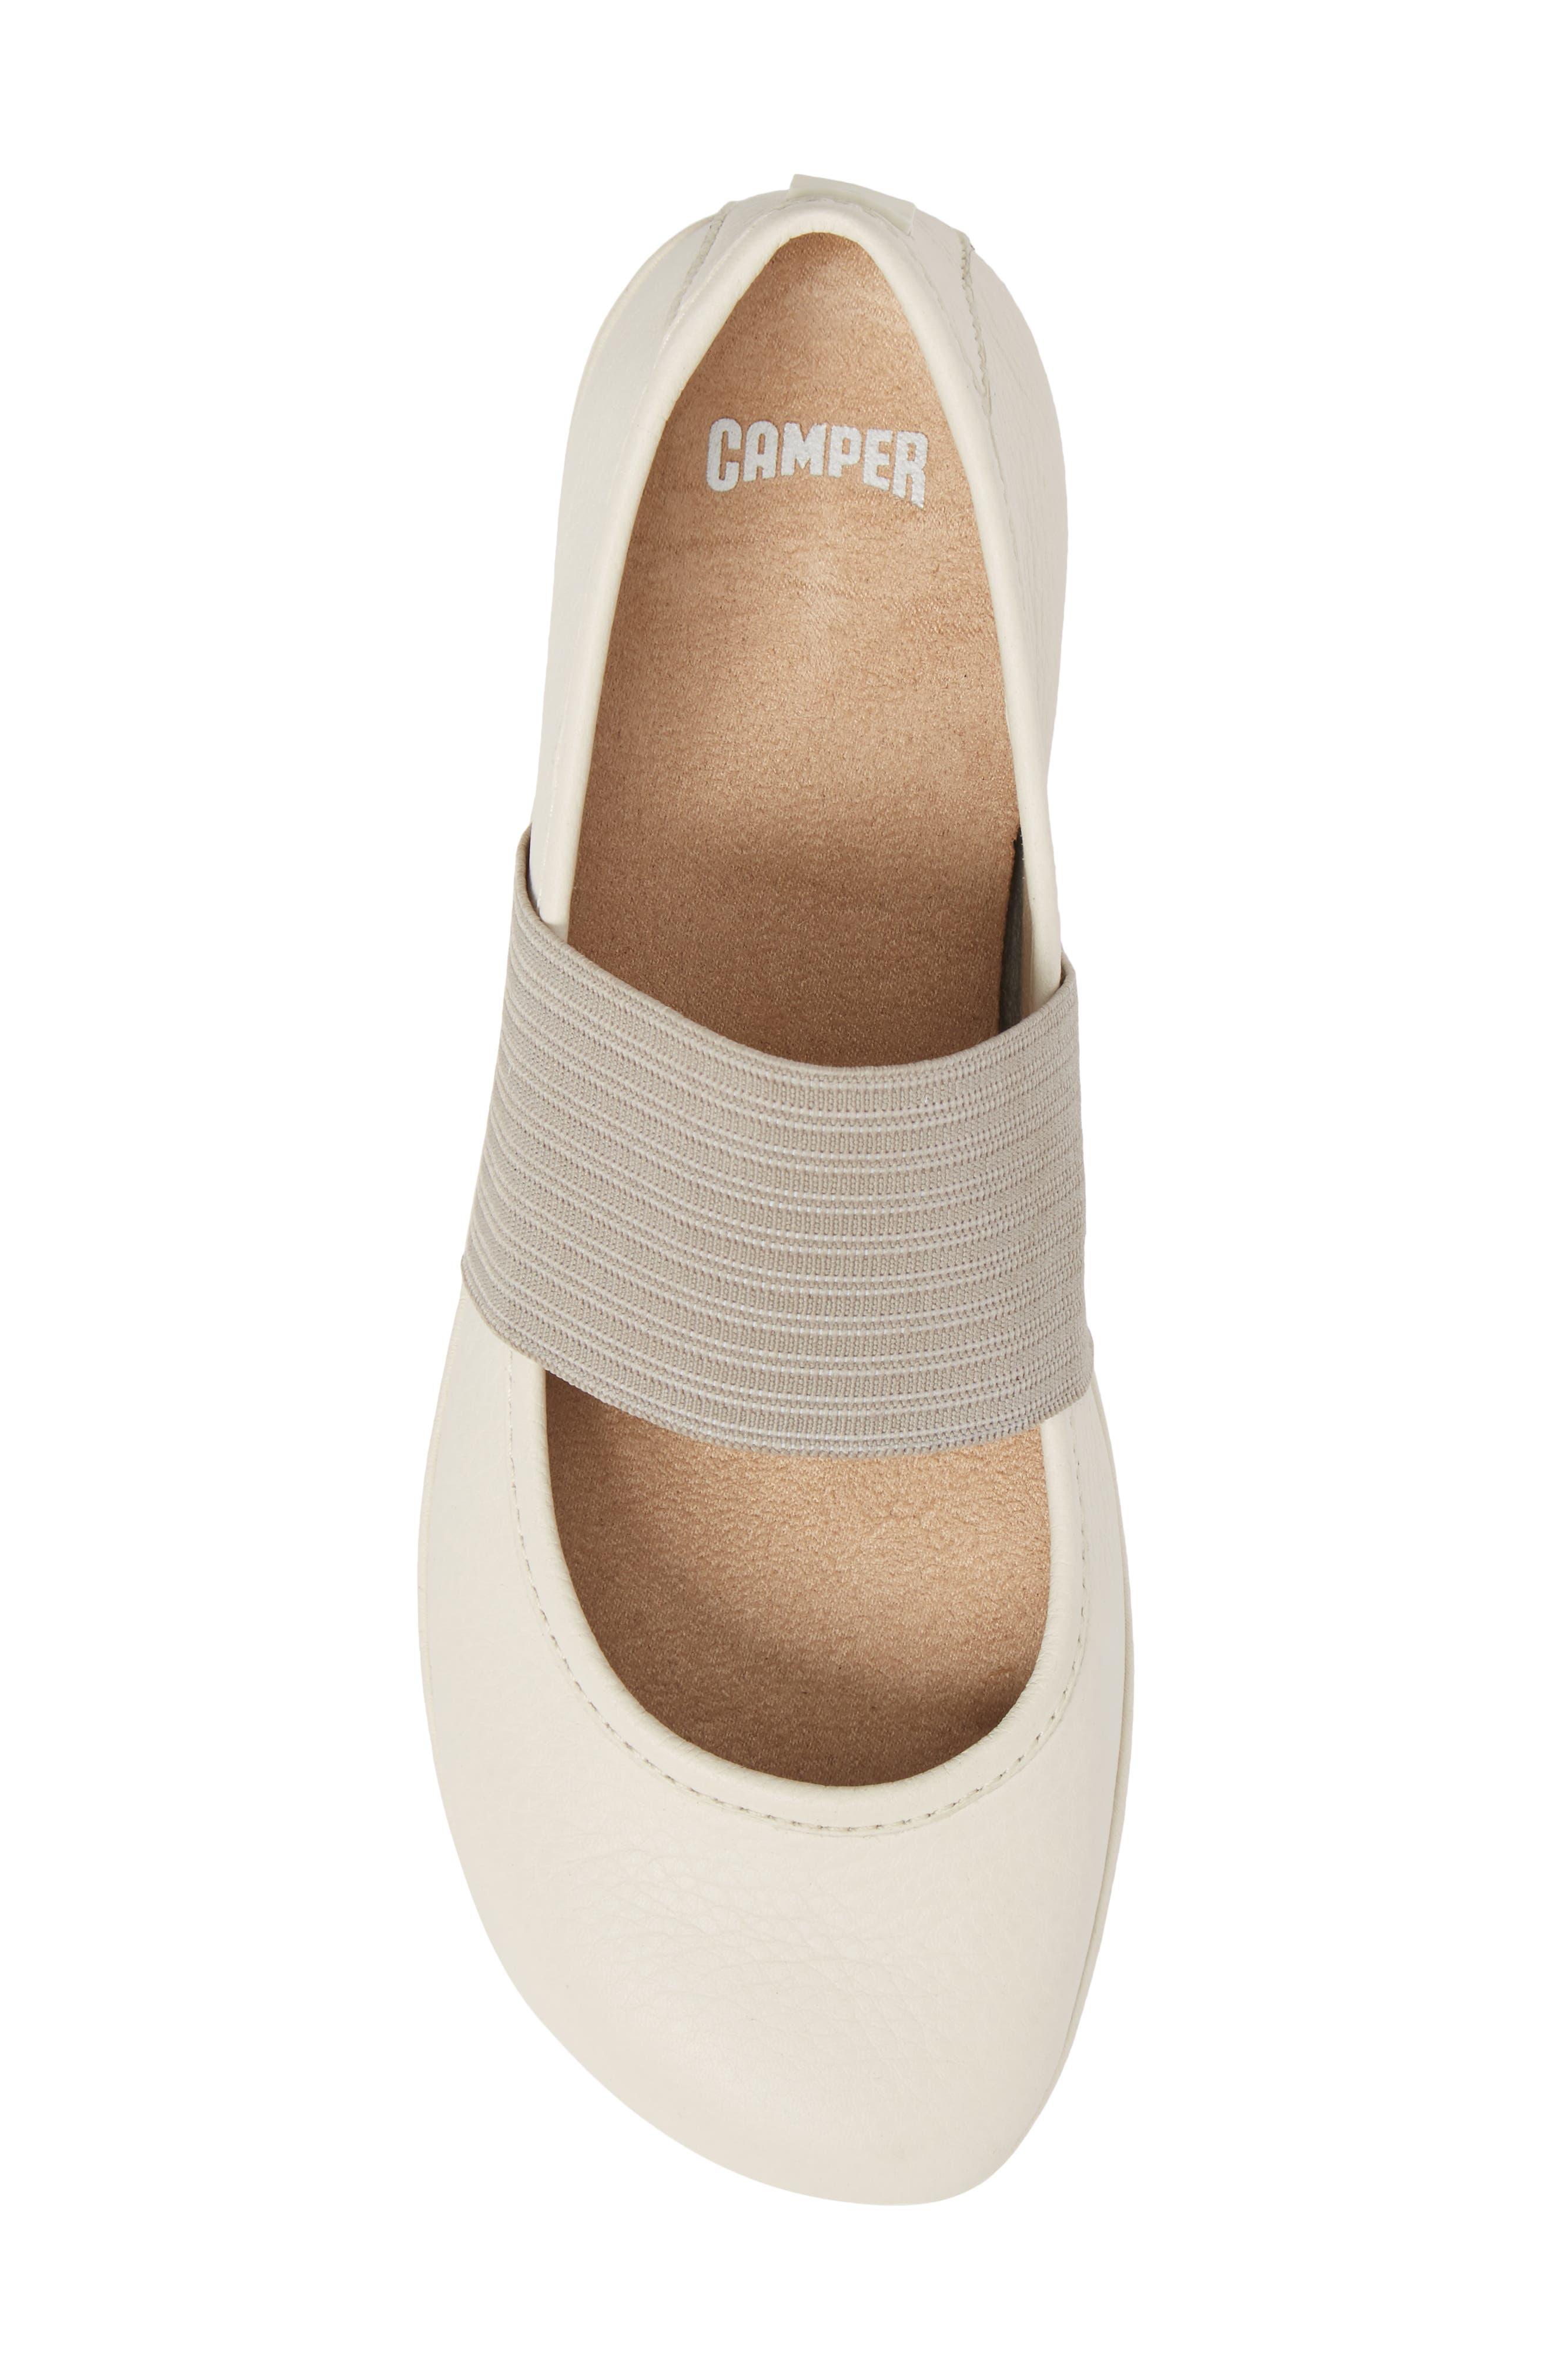 'Right Nina' Leather Ballerina Flat,                             Alternate thumbnail 5, color,                             Light Beige Leather